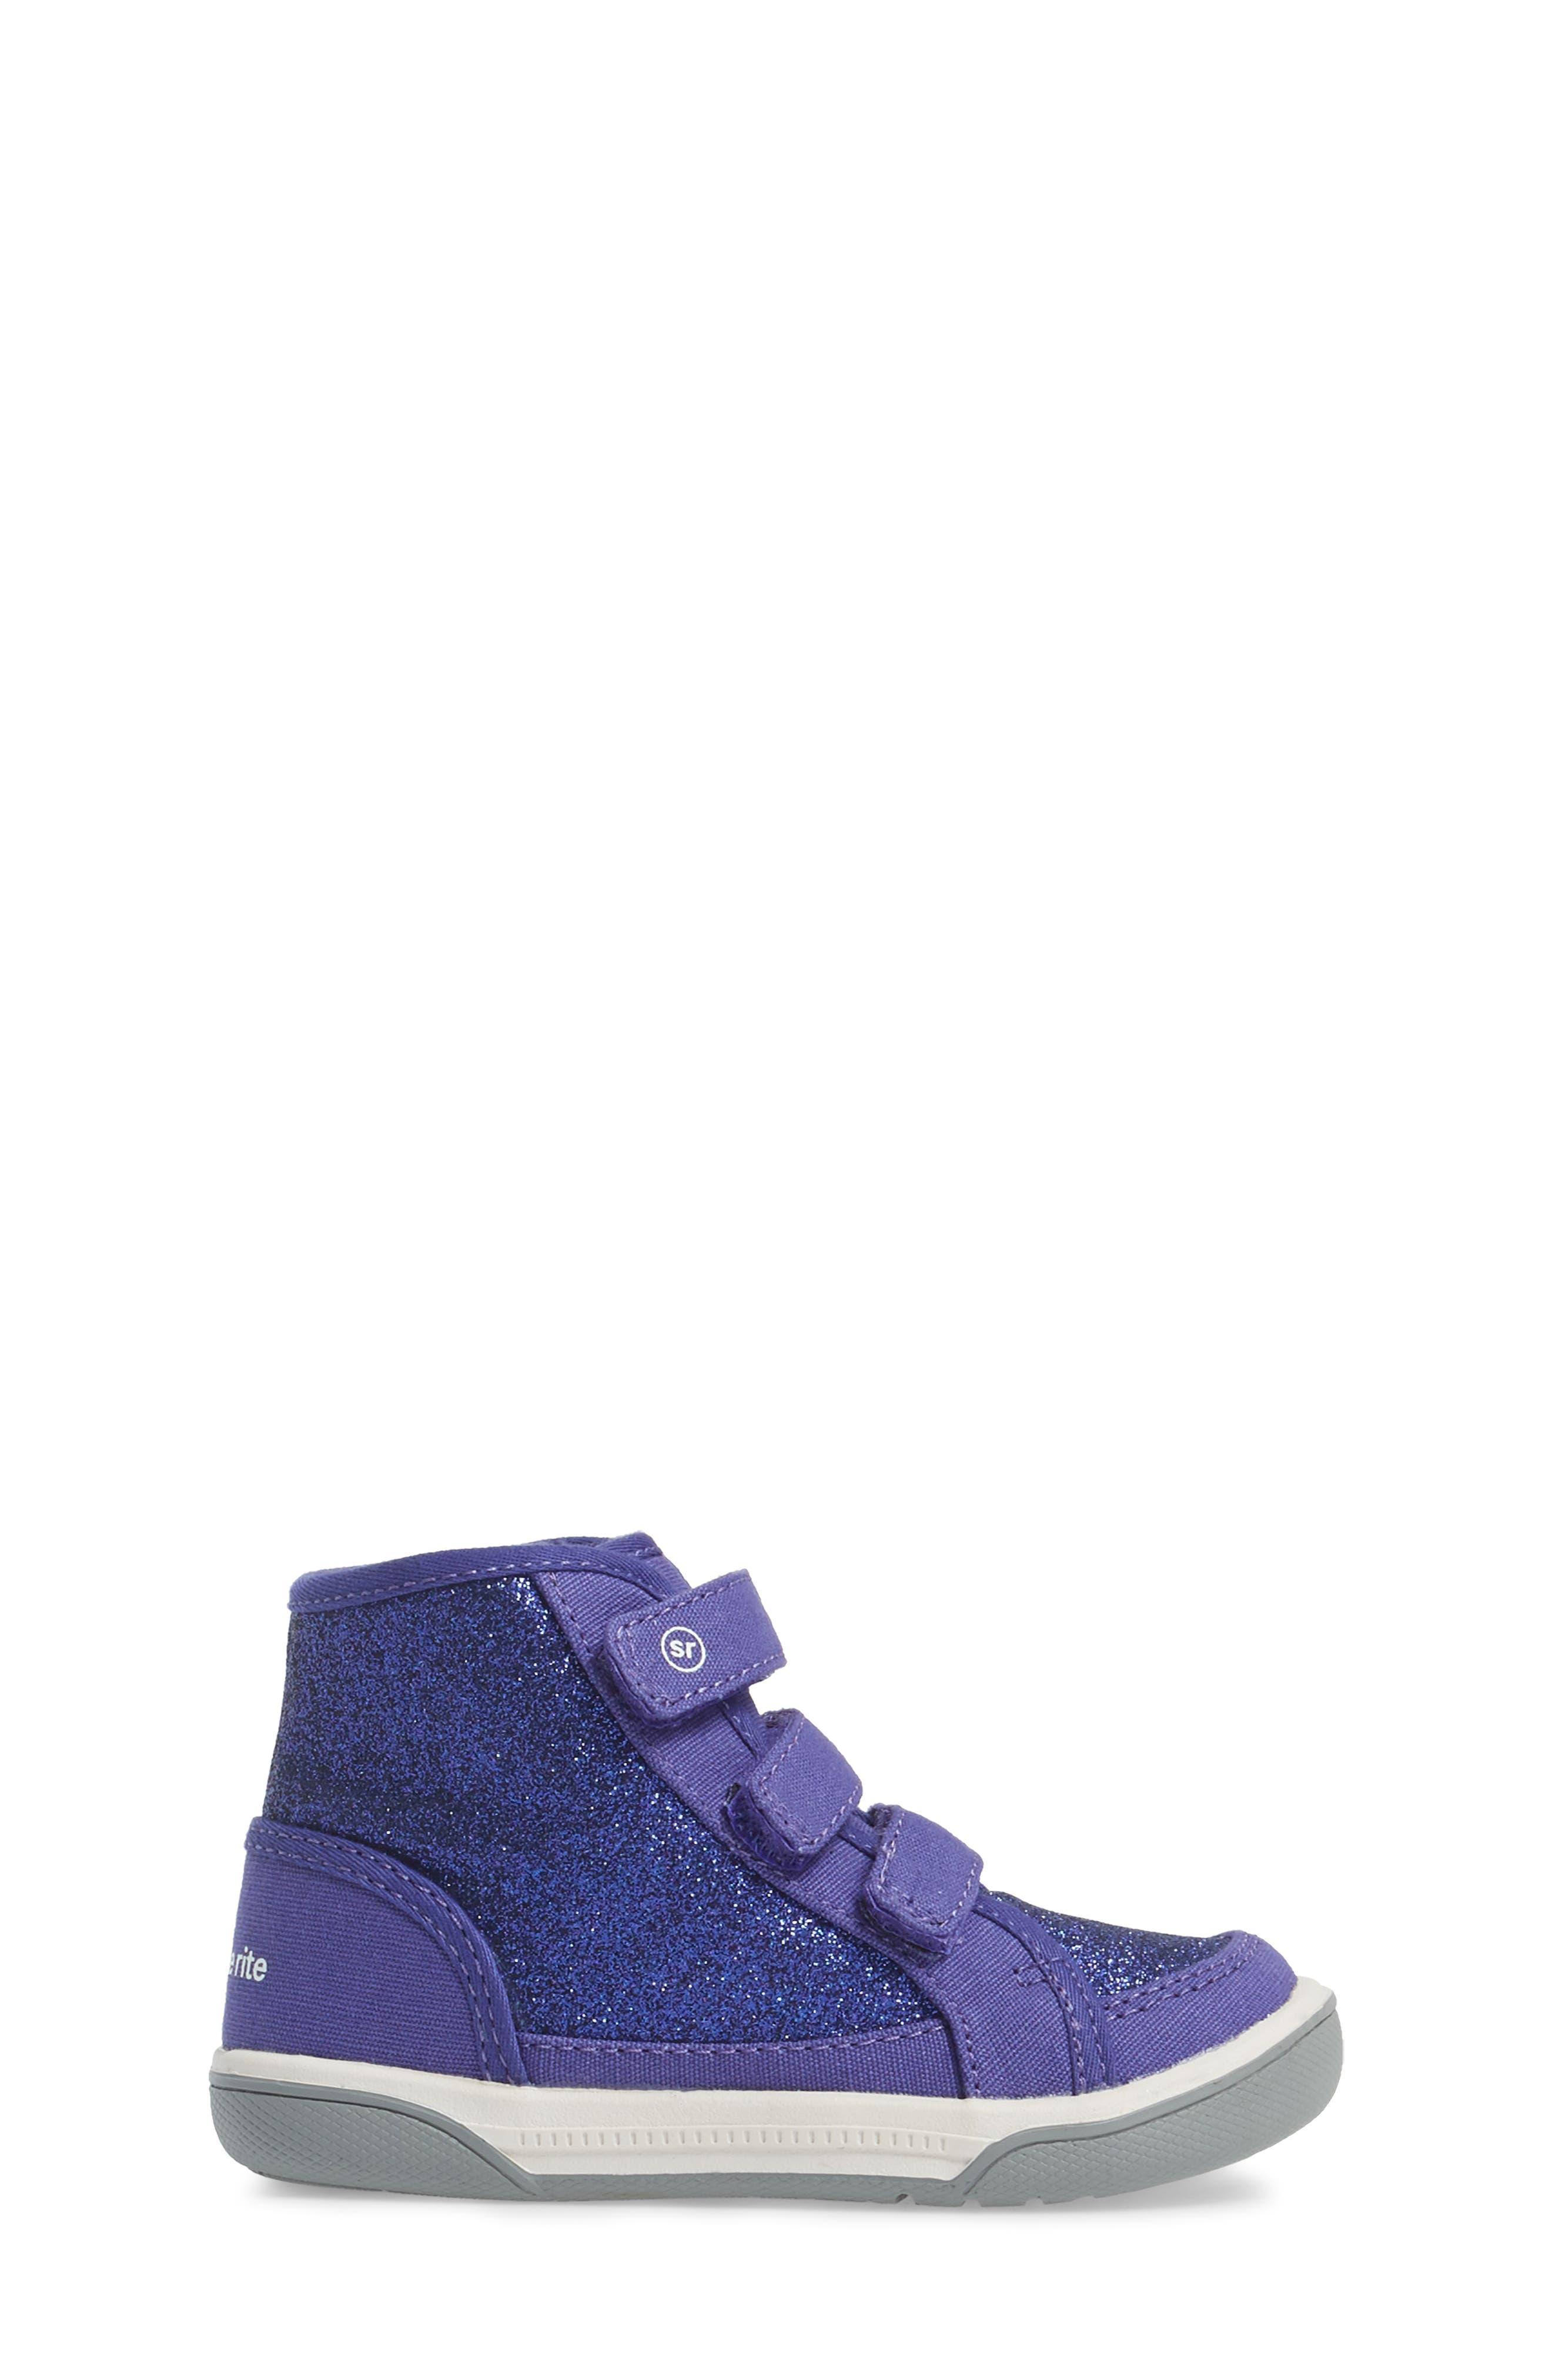 Alternate Image 3  - Stride Rite Ellis Glitter High Top Sneaker (Baby, Walker & Toddler)